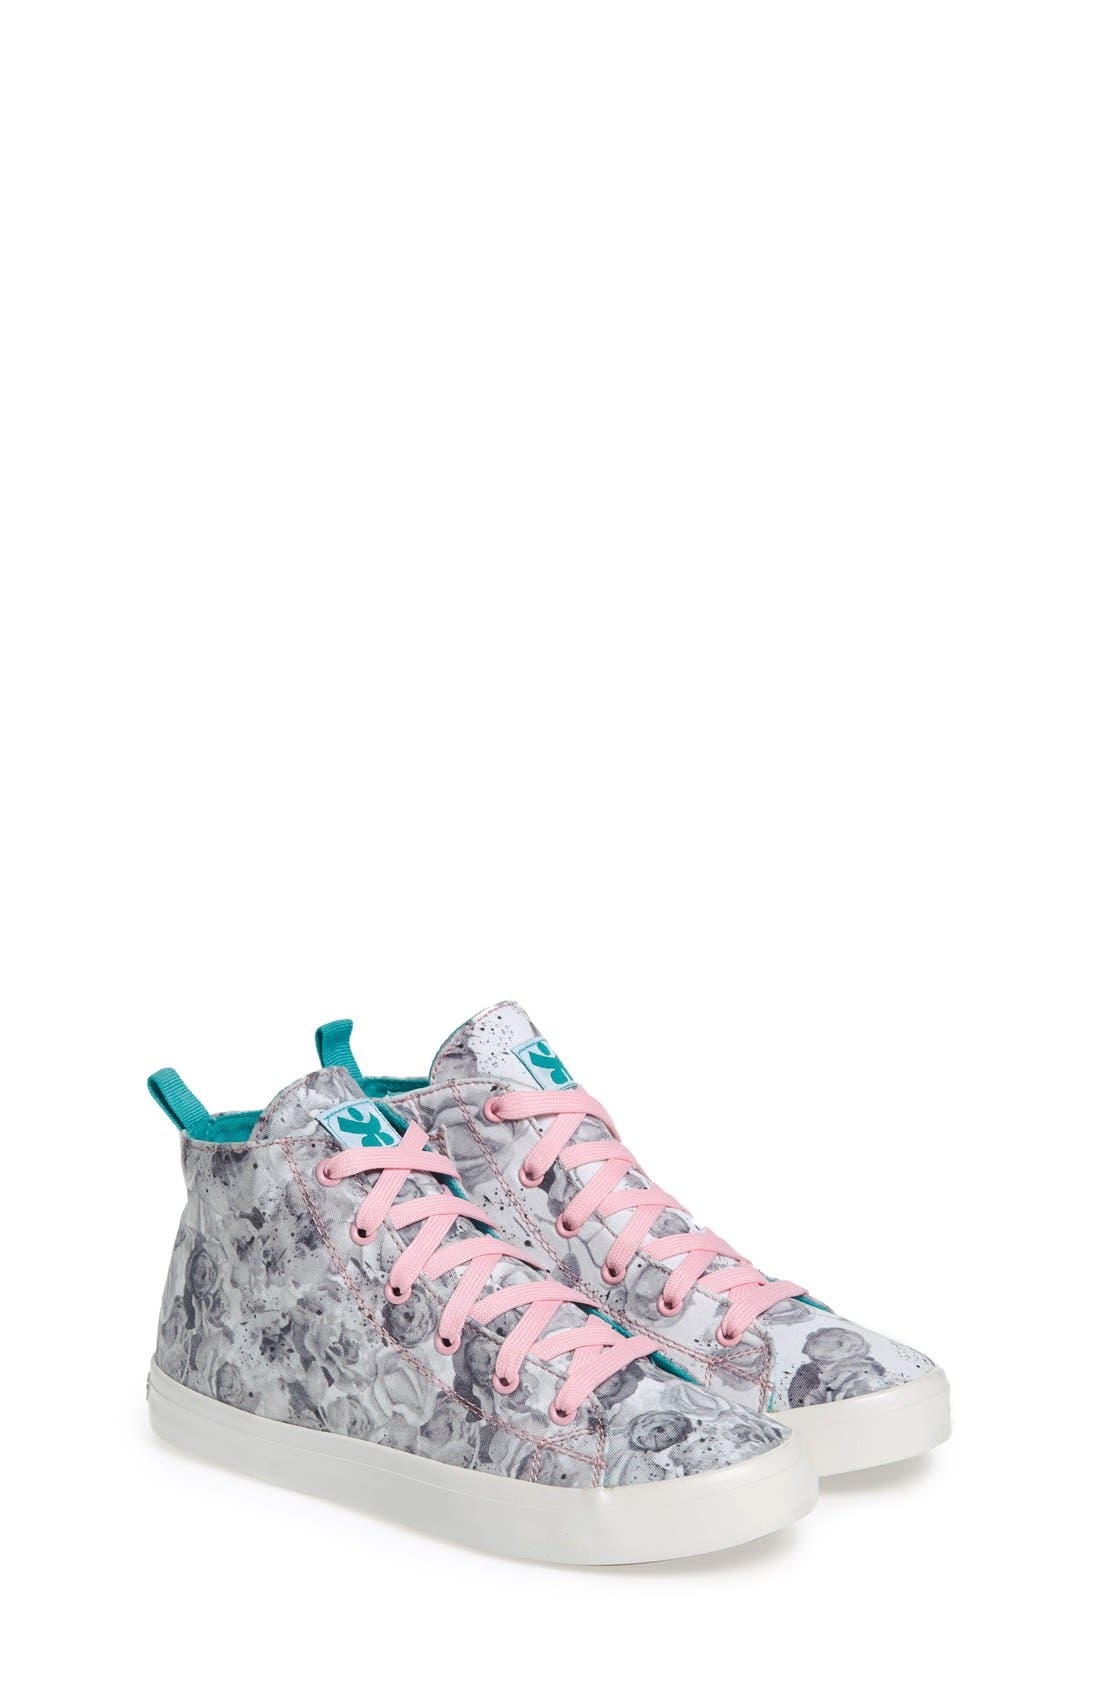 CHOOZE 'Spark' High Top Sneaker (Toddler, Little Kid & Big Kid)